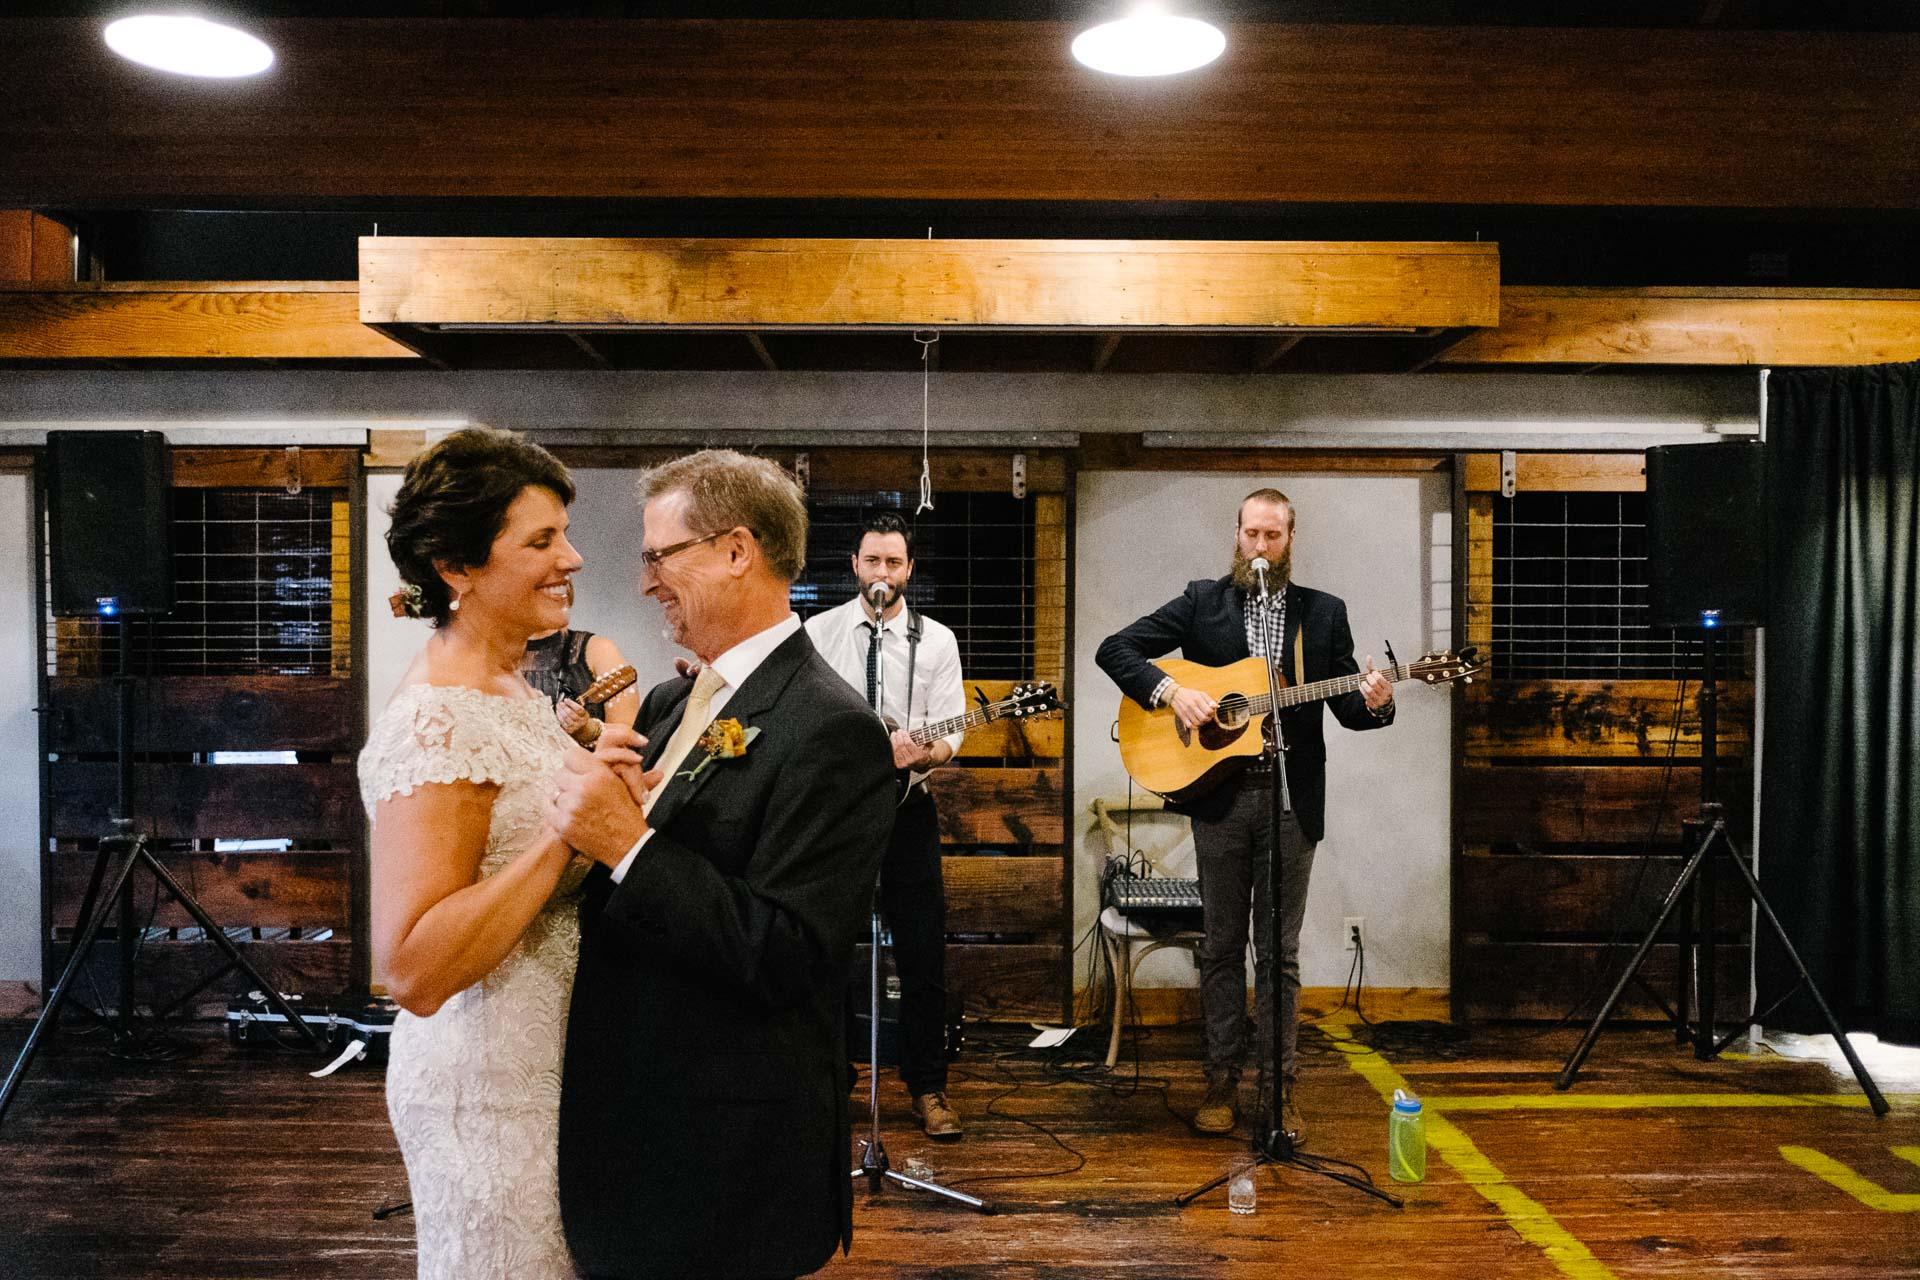 excelsior-wedding-photographer-pique-travel-design-ntm0025